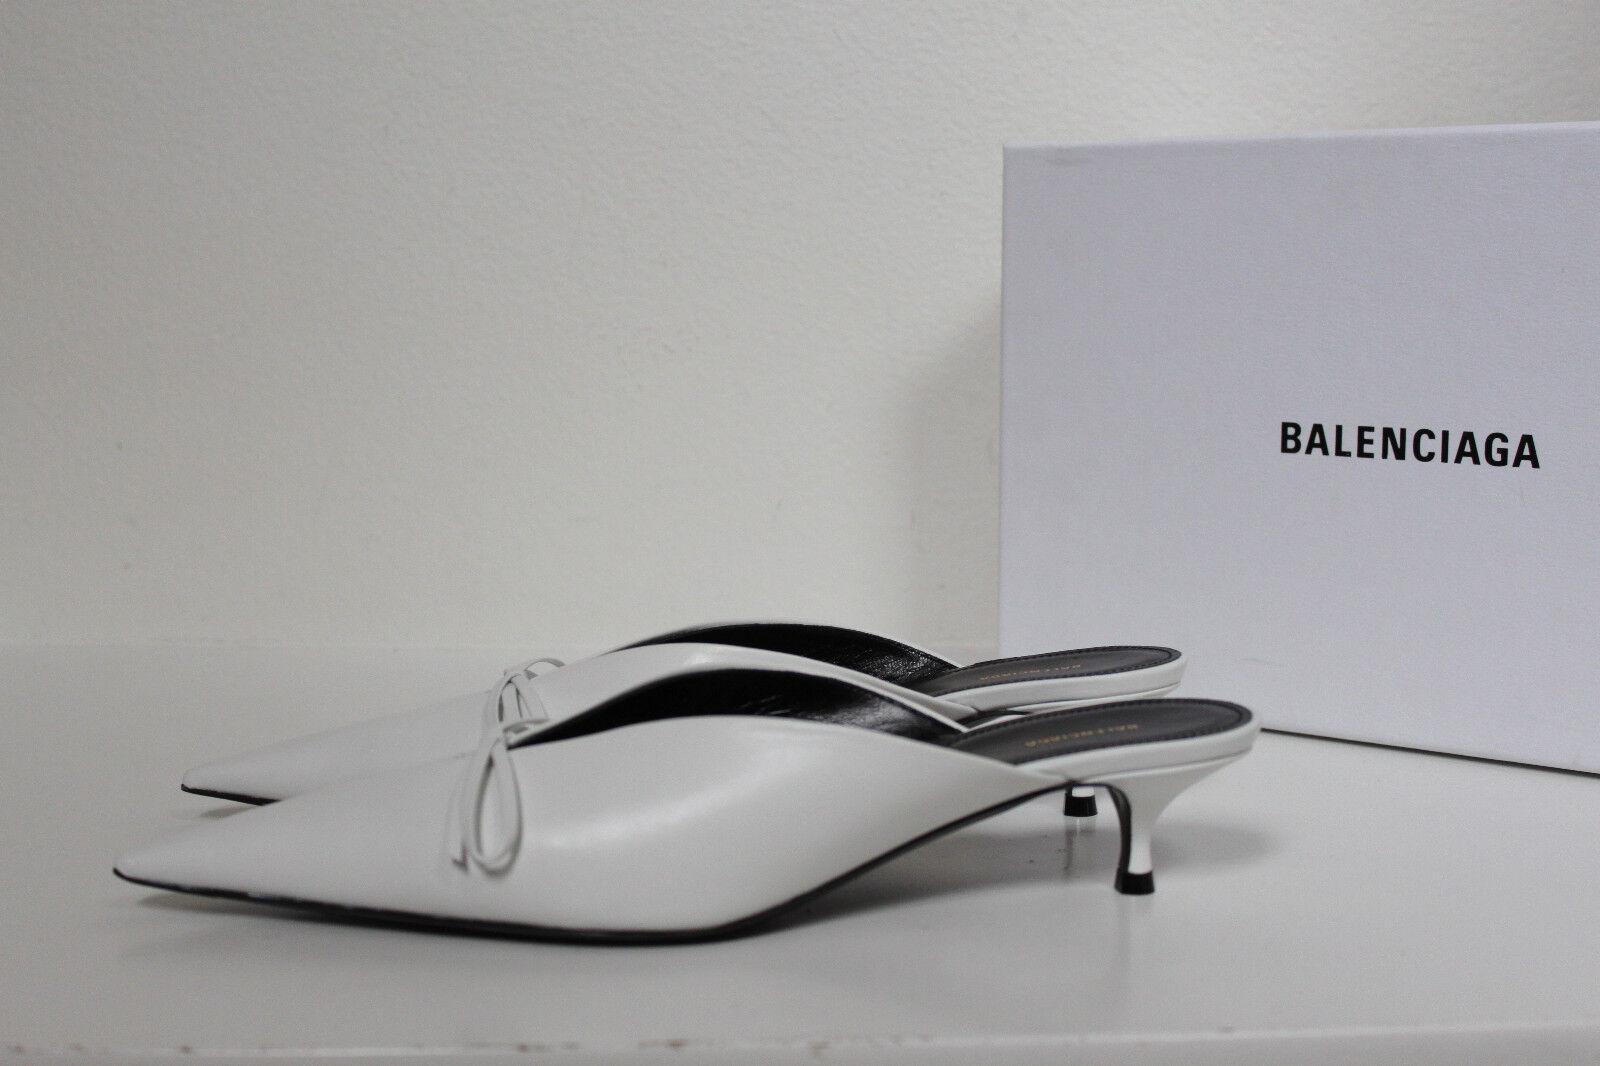 New sz 9   39.5 Balenciaga Weiß Leather Bow Pointed Toe Mule Pump schuhe